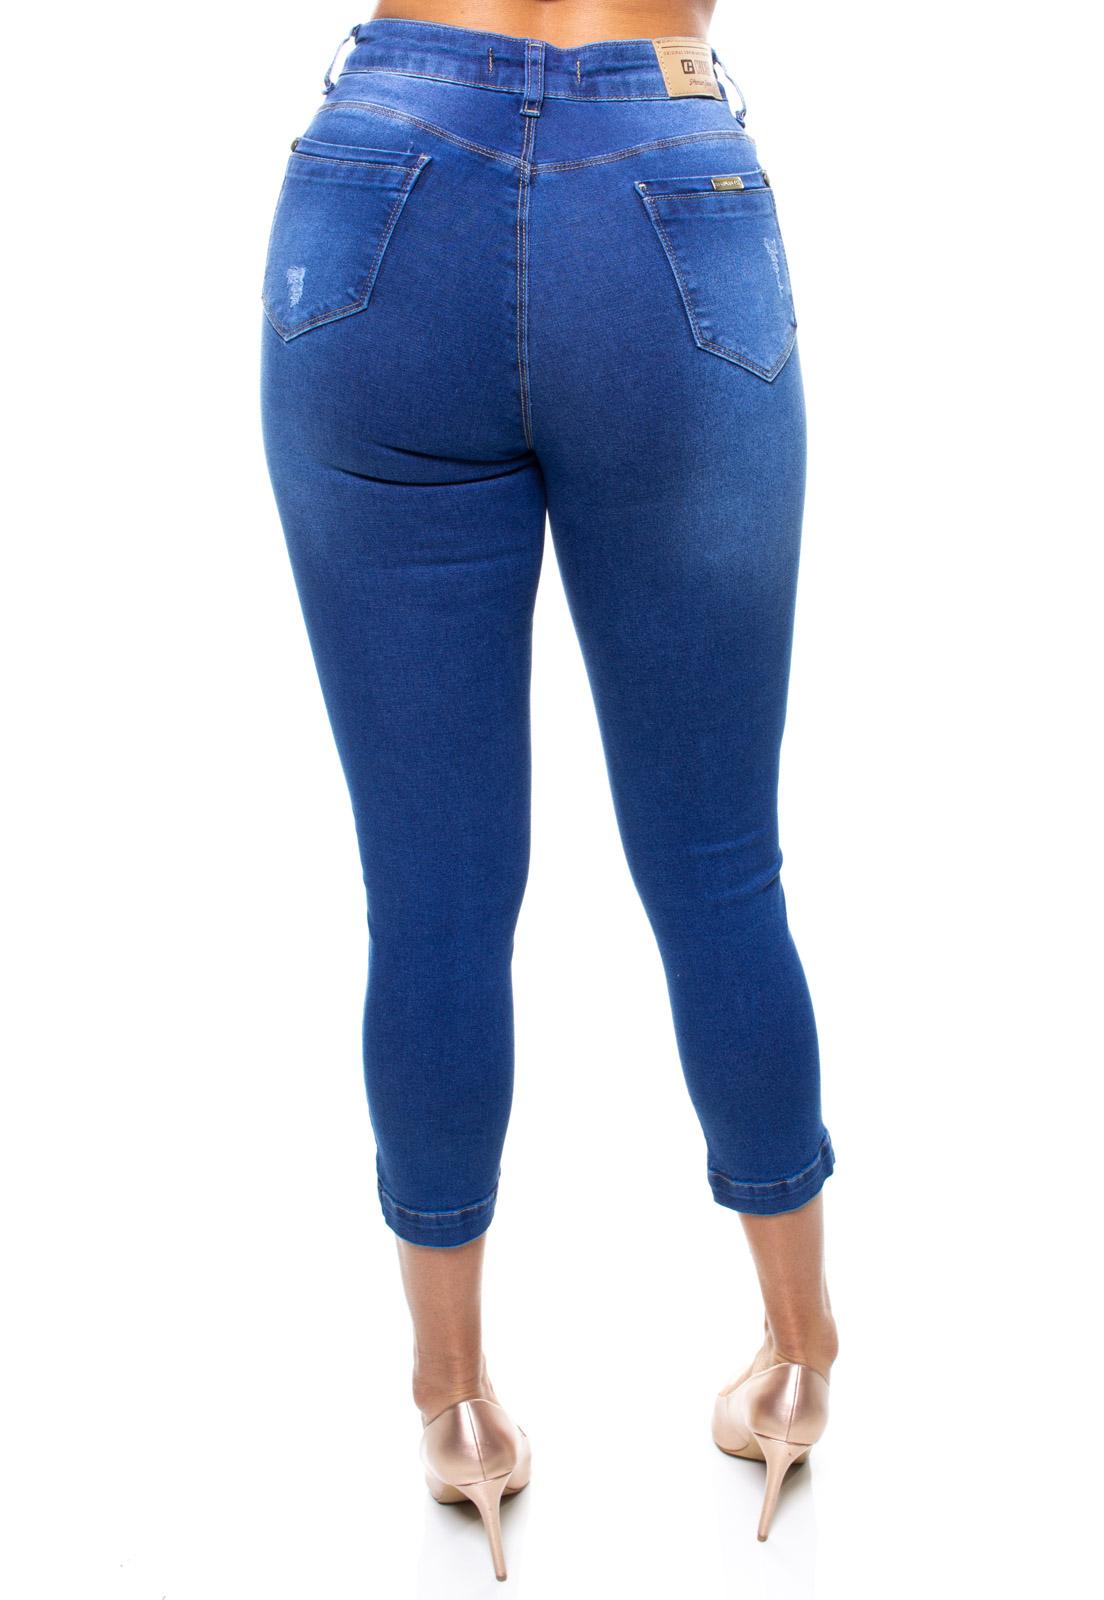 Calça Capri Jeans Feminina Crocker - 47756  - CROCKER JEANS